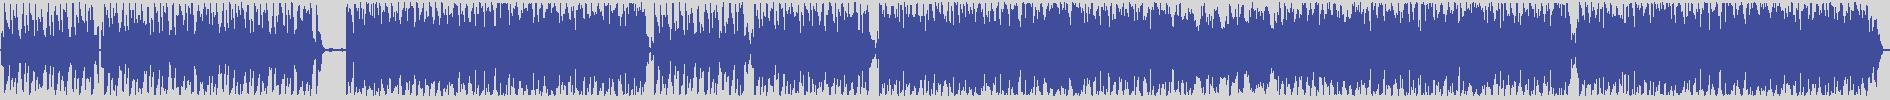 gold_hit_records [GHR006] Pachy - Si Va Su [Radio Edit] audio wave form